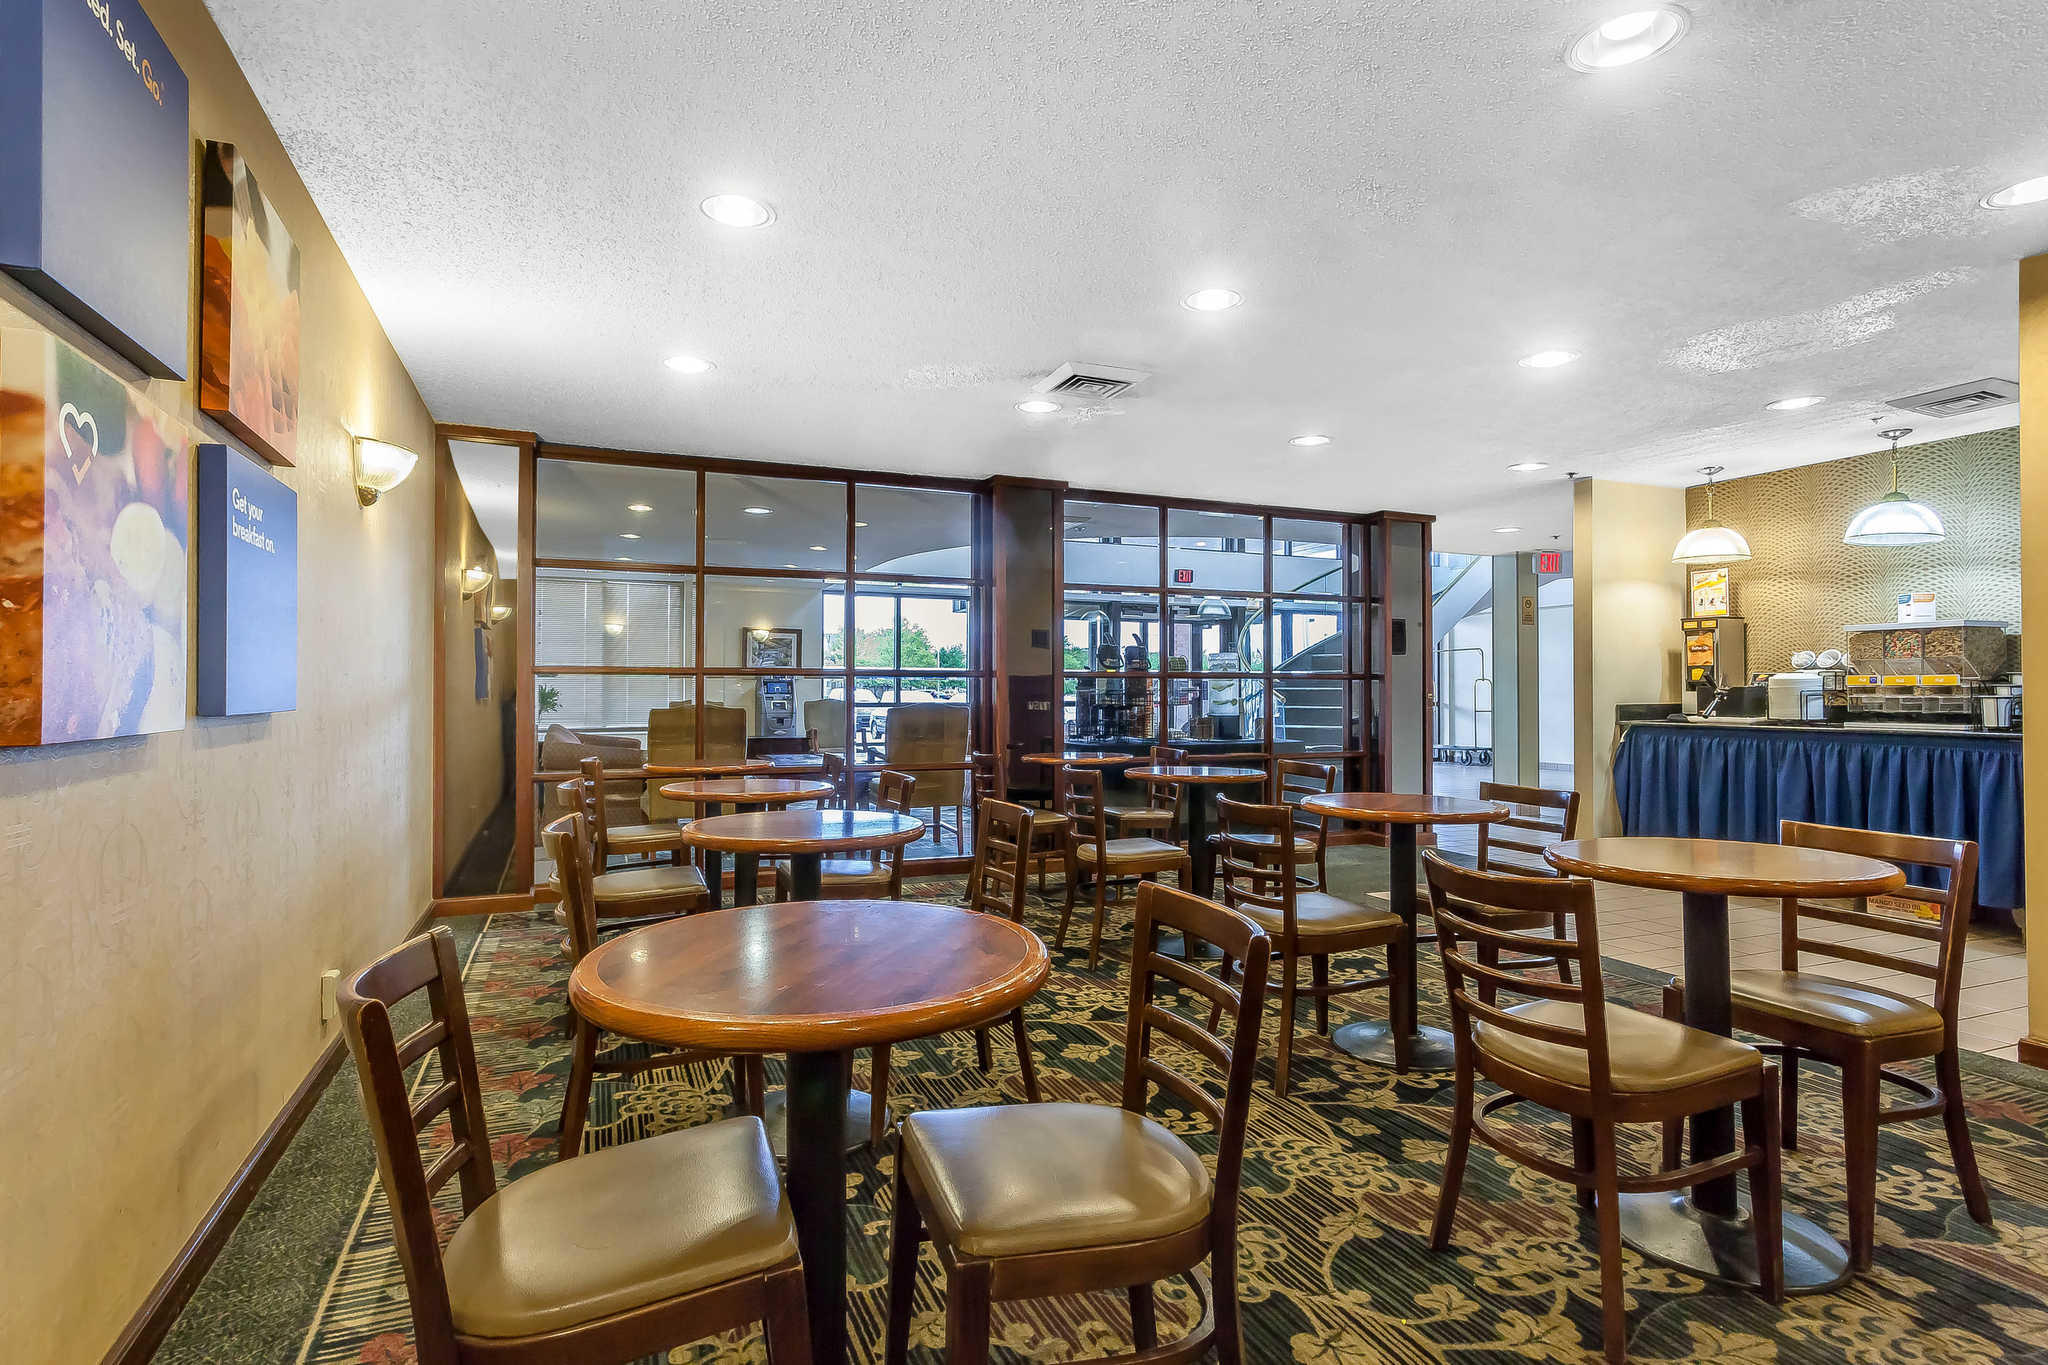 Comfort Inn Cleveland Airport image 20